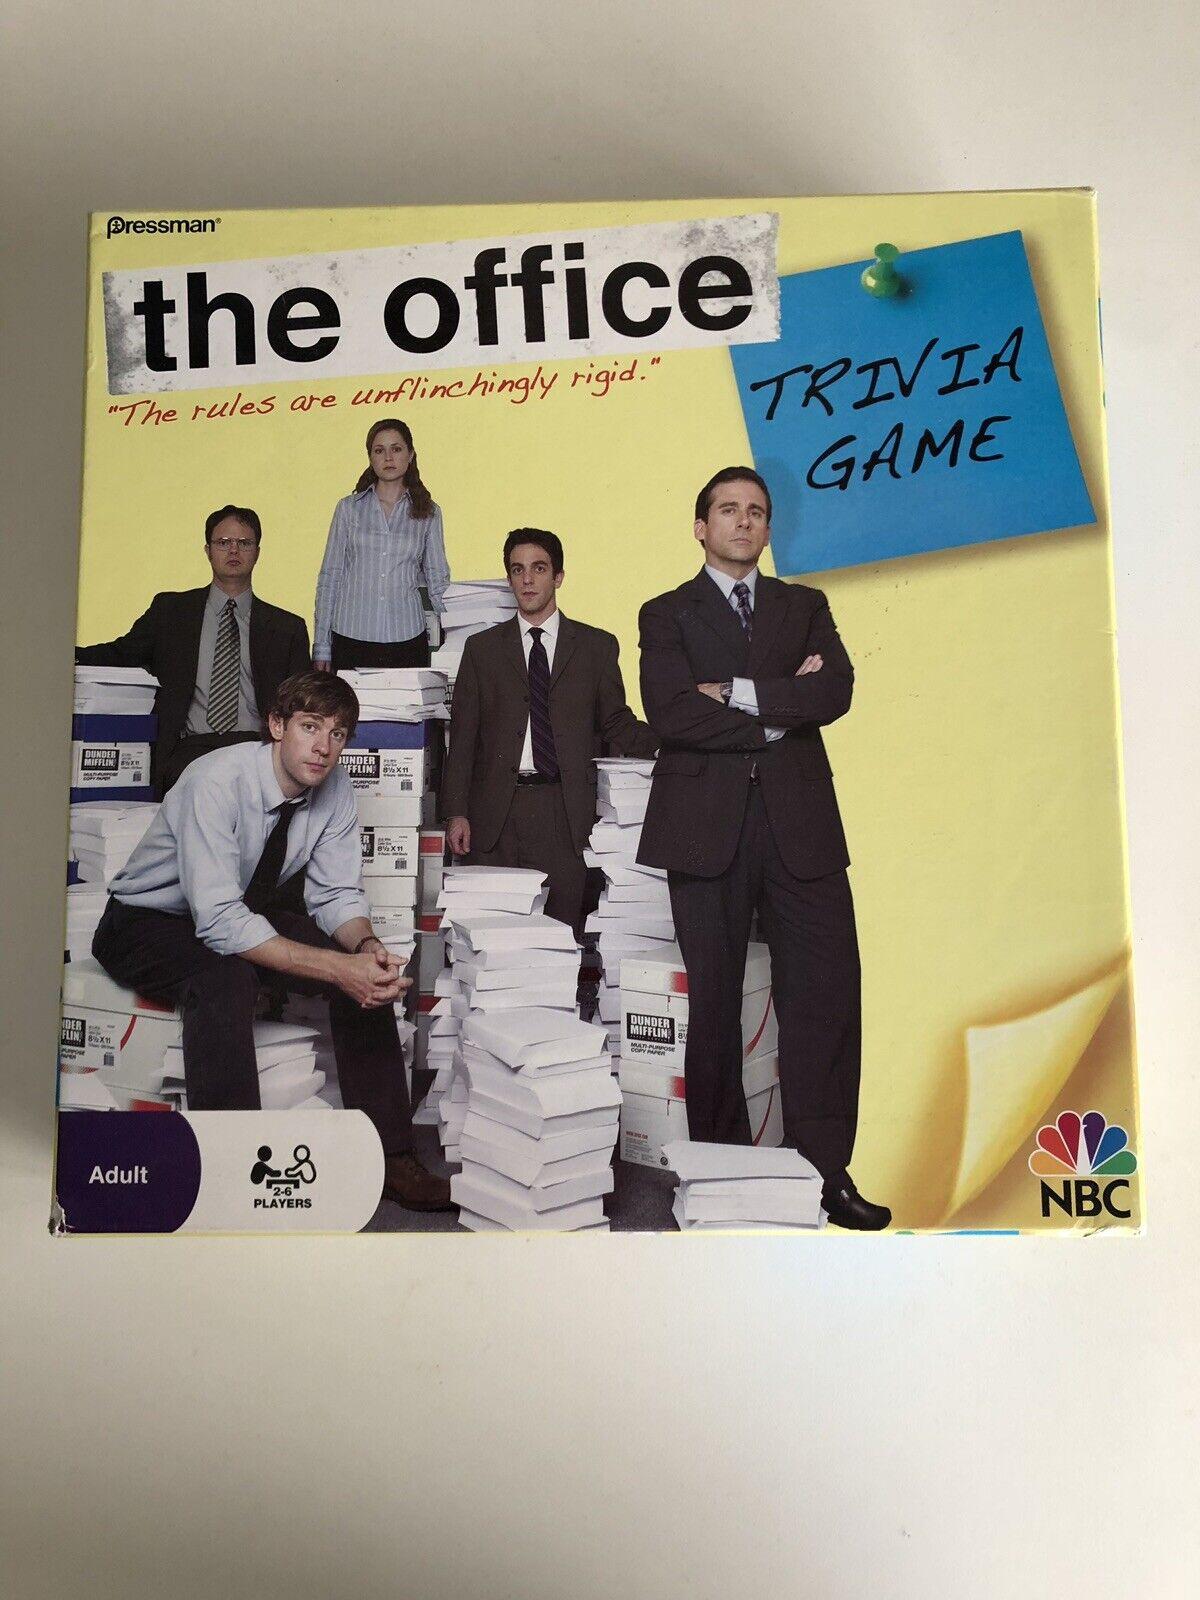 The Office Trivia tavola gioco Dundler  Mifflin NBC mostrare Pressuomo Rare  economico online